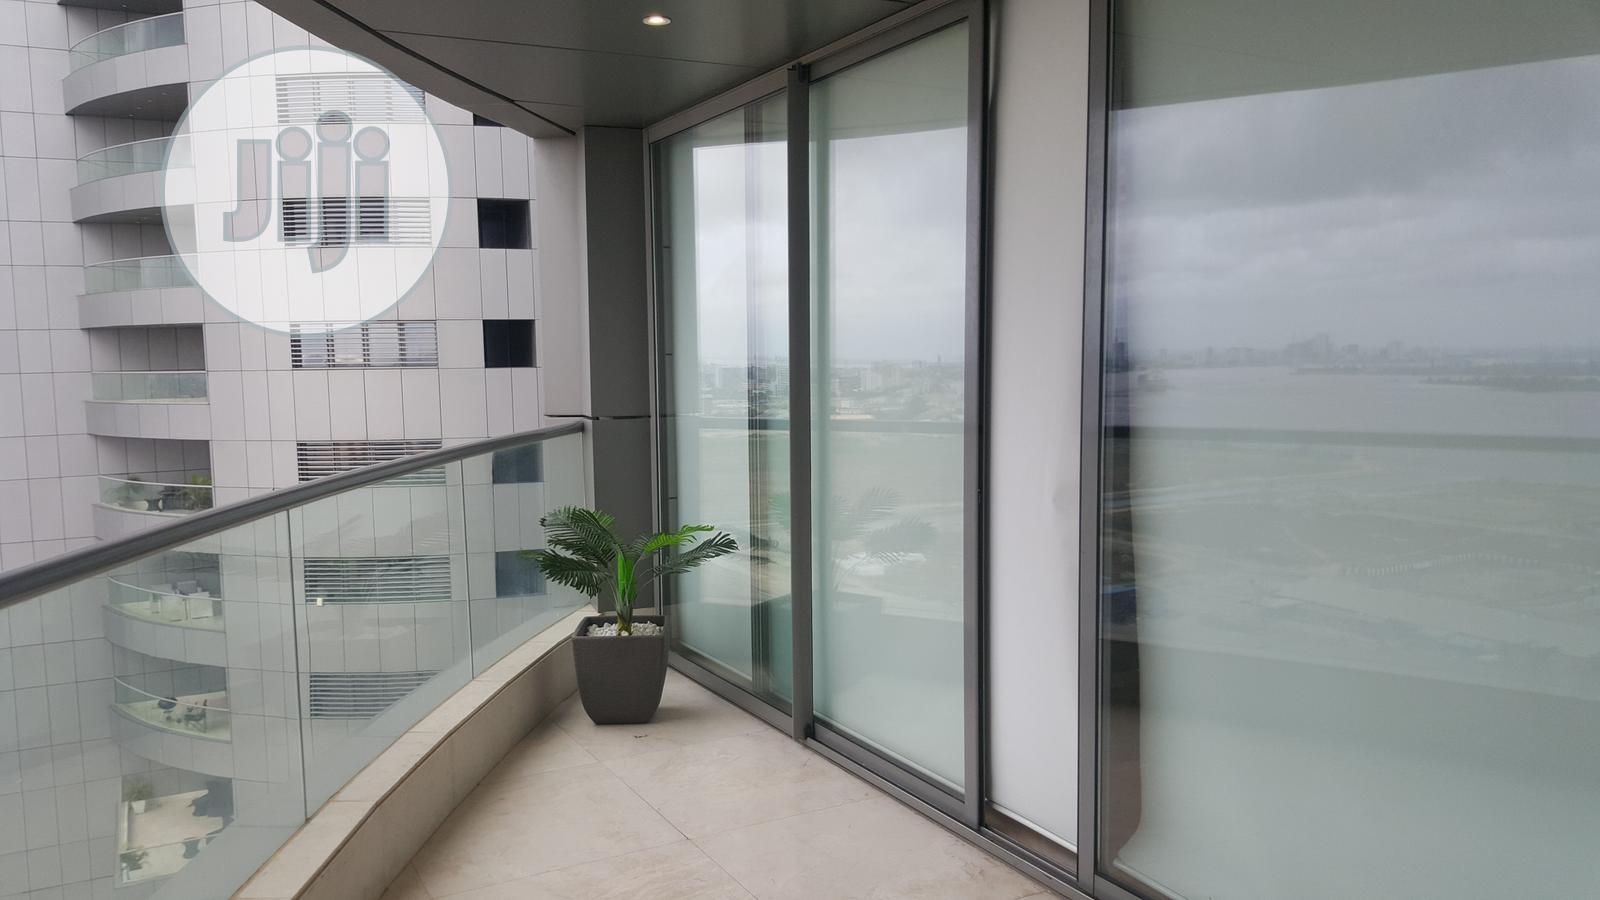 Luxury 2 Bedroom Penthouse At Eko Atlantic For Shotlet | Short Let for sale in Eko Atlantic, Lagos State, Nigeria